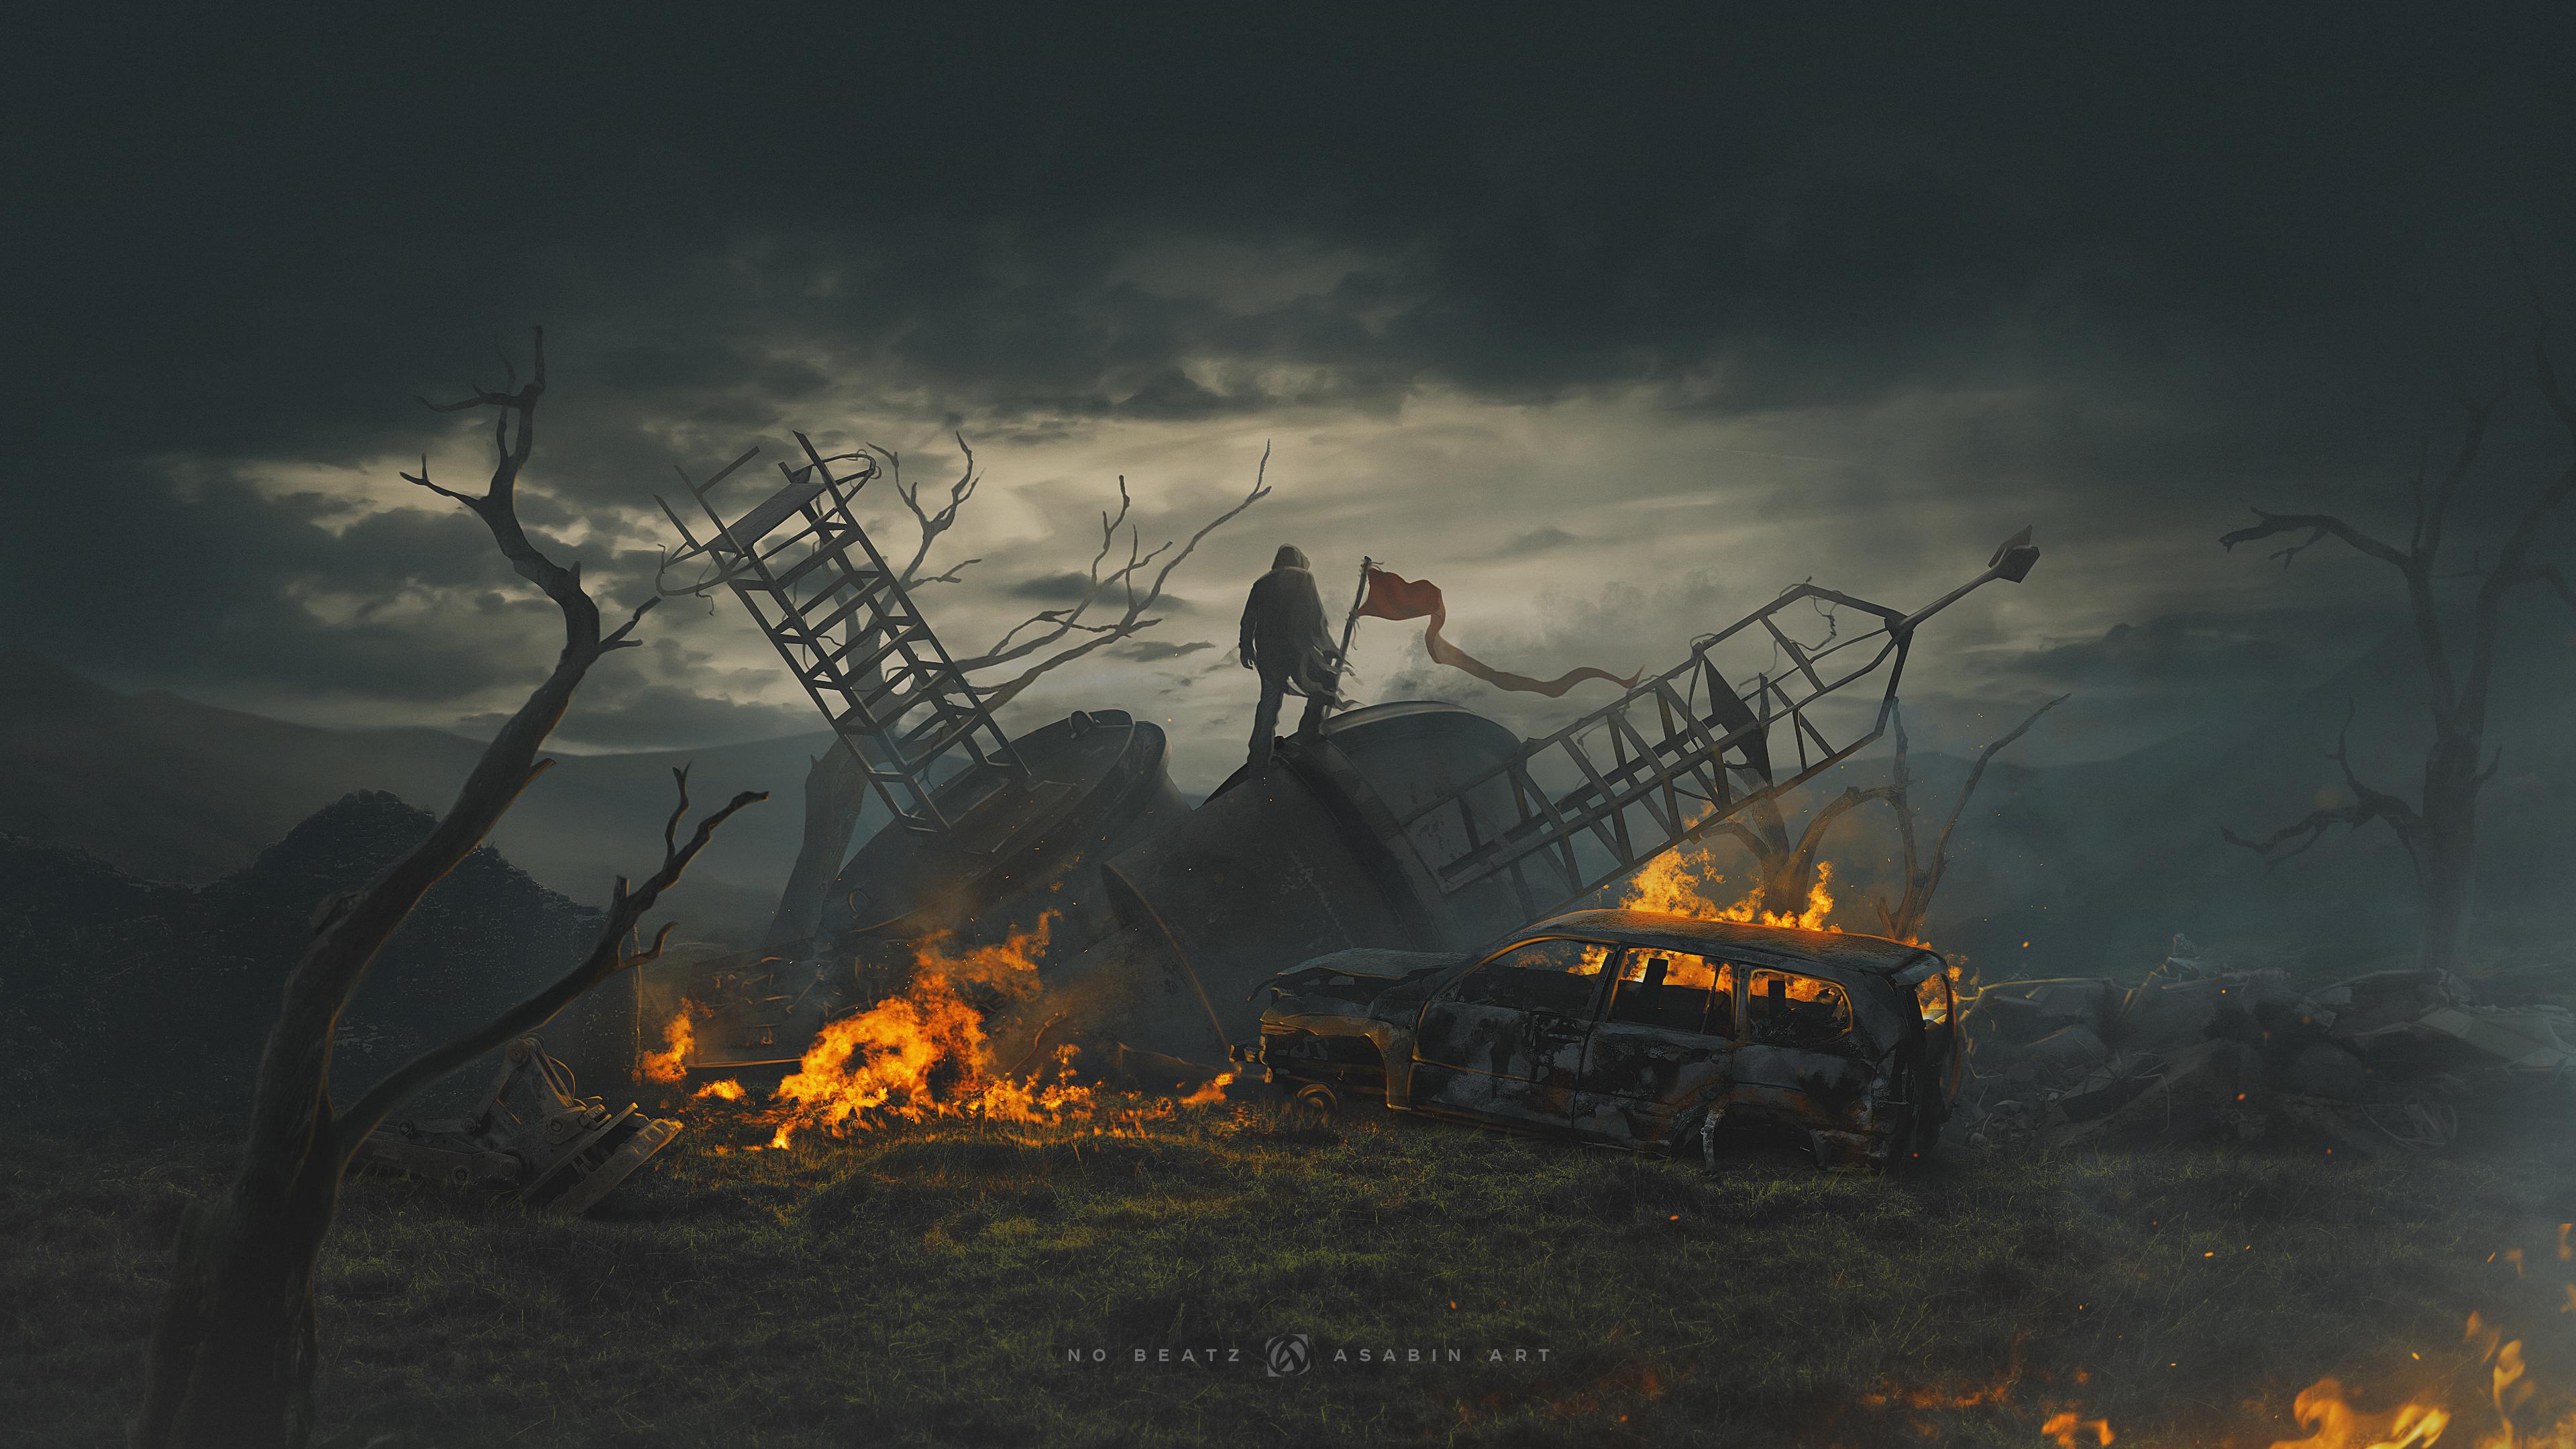 The Last Frontier 4k, HD Artist, 4k Wallpapers, Images ...